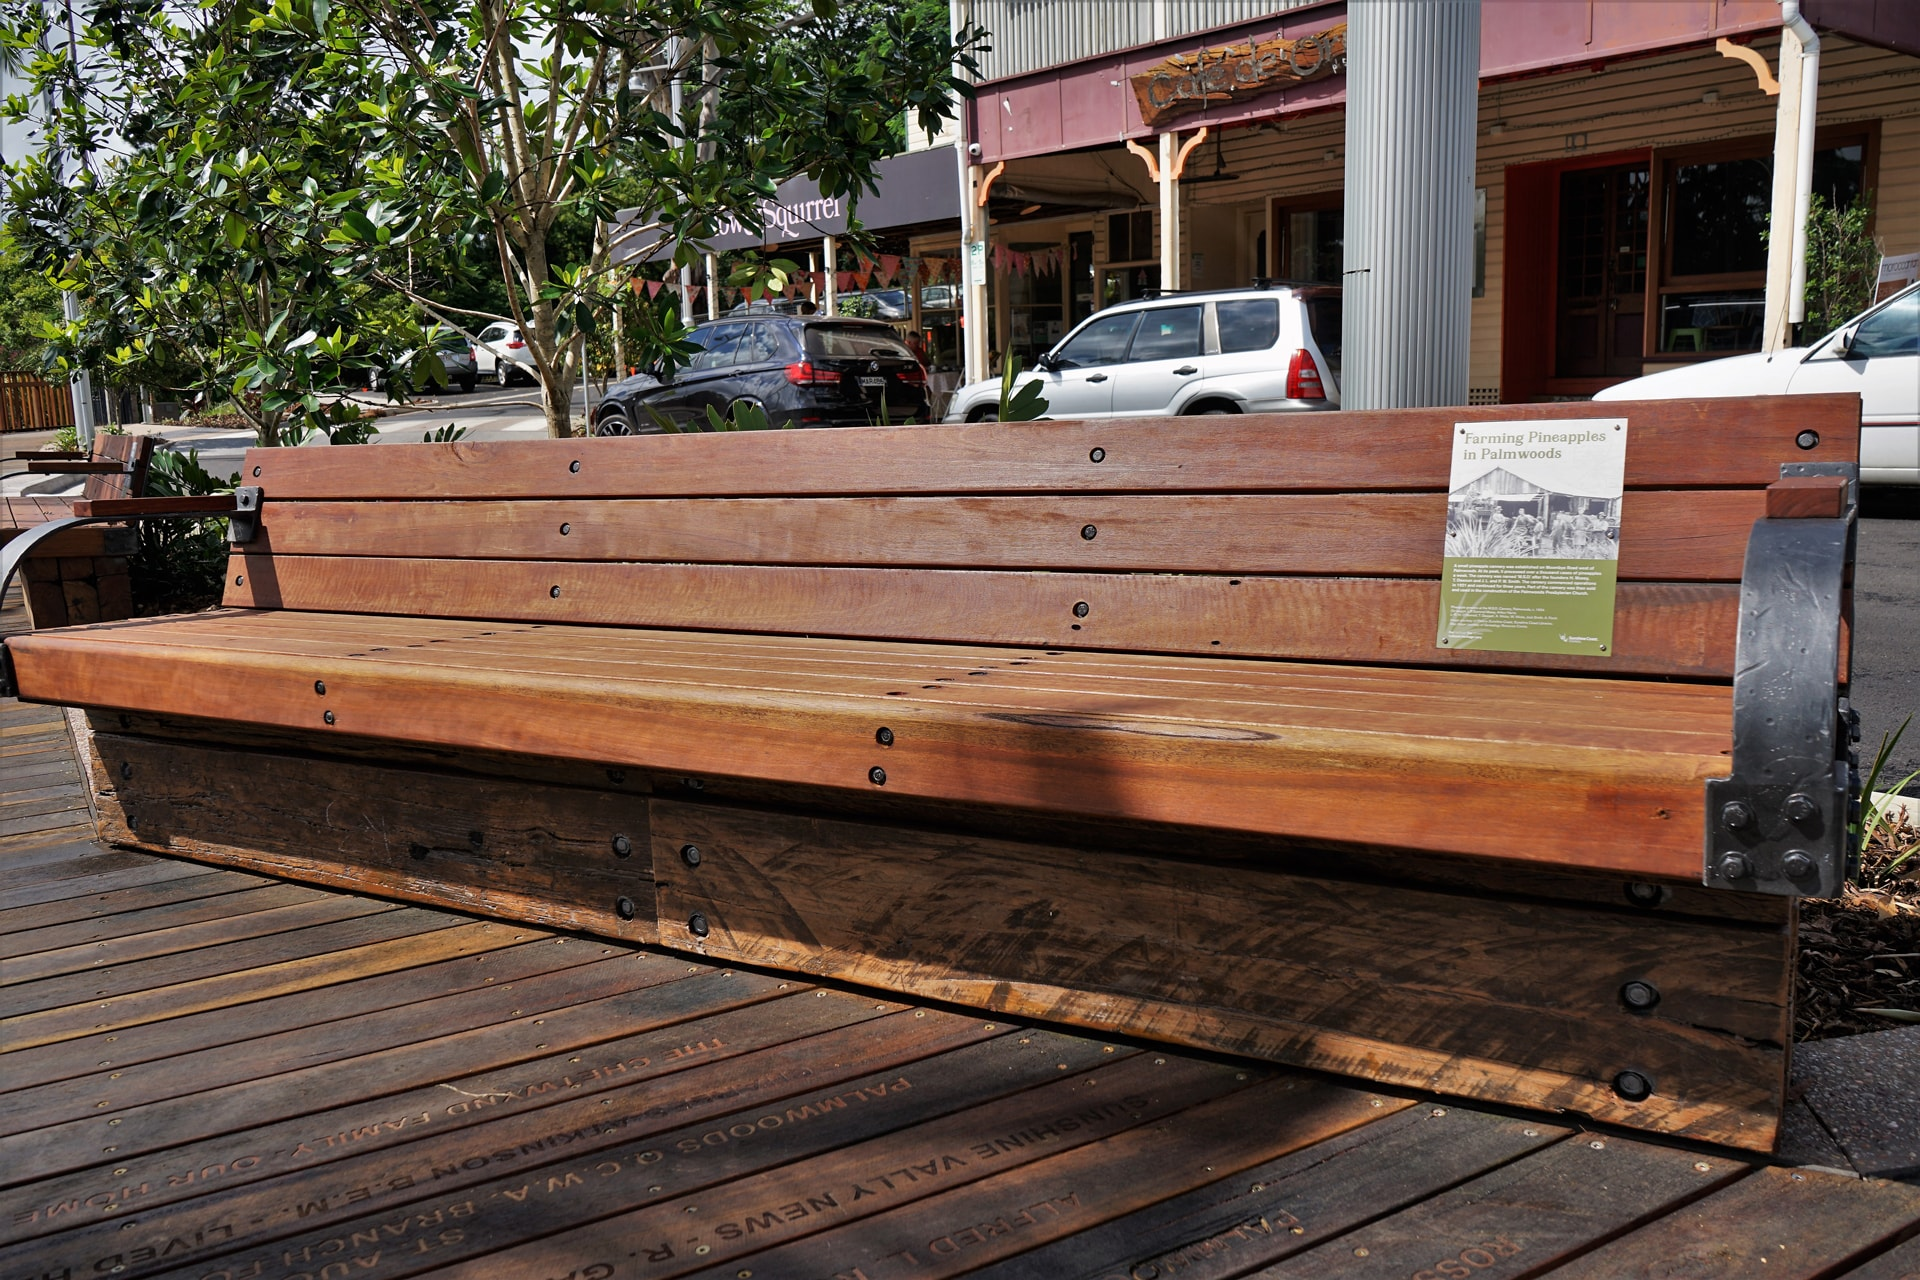 11-PalmwoodsTownSquare-PeterSyson.jpg